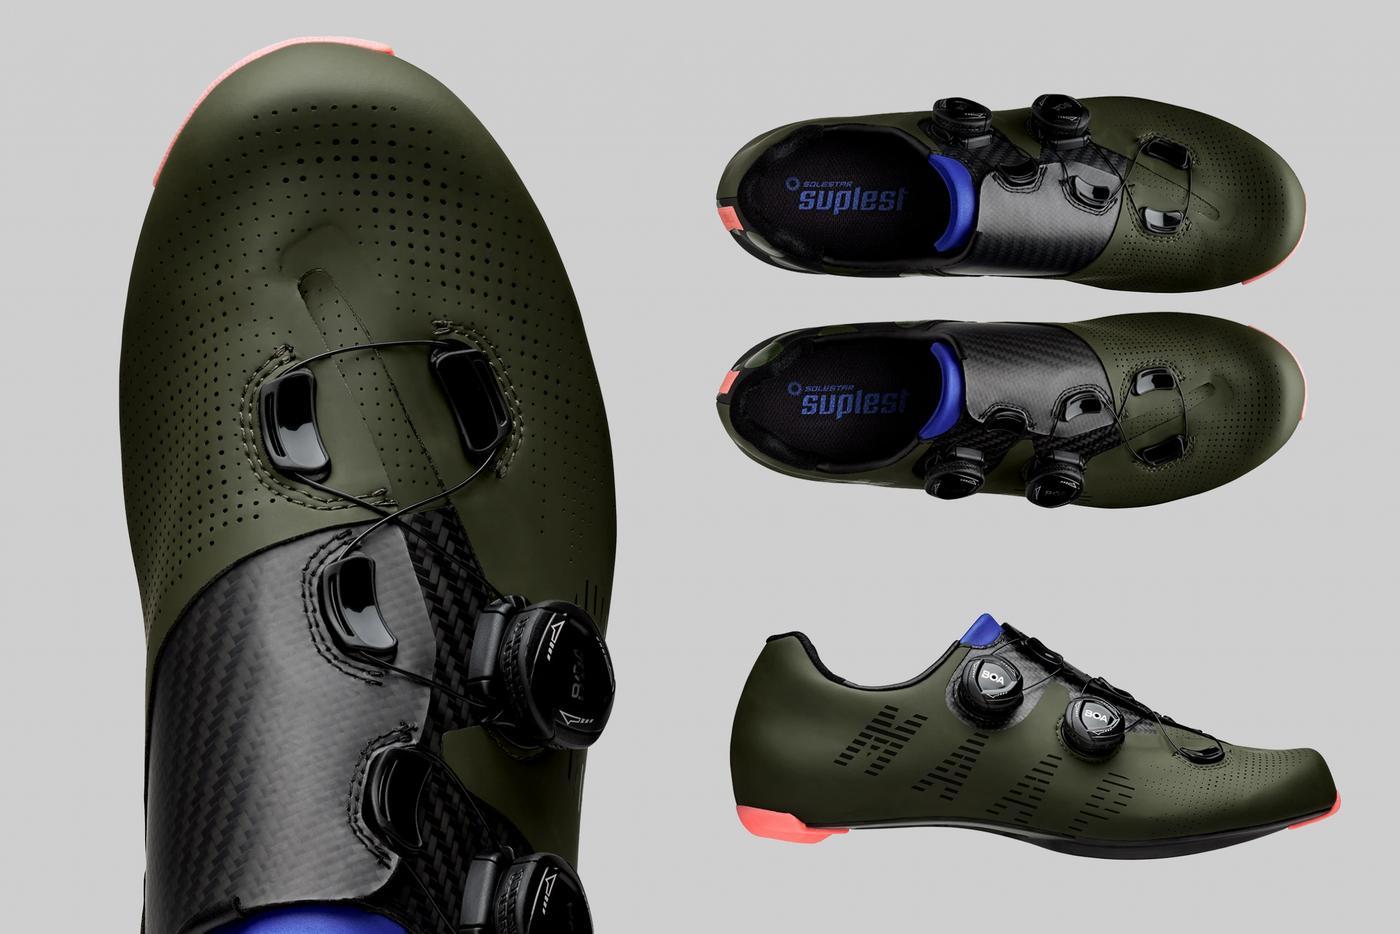 MAAP x Suplest Edge+ Road Pro Shoe